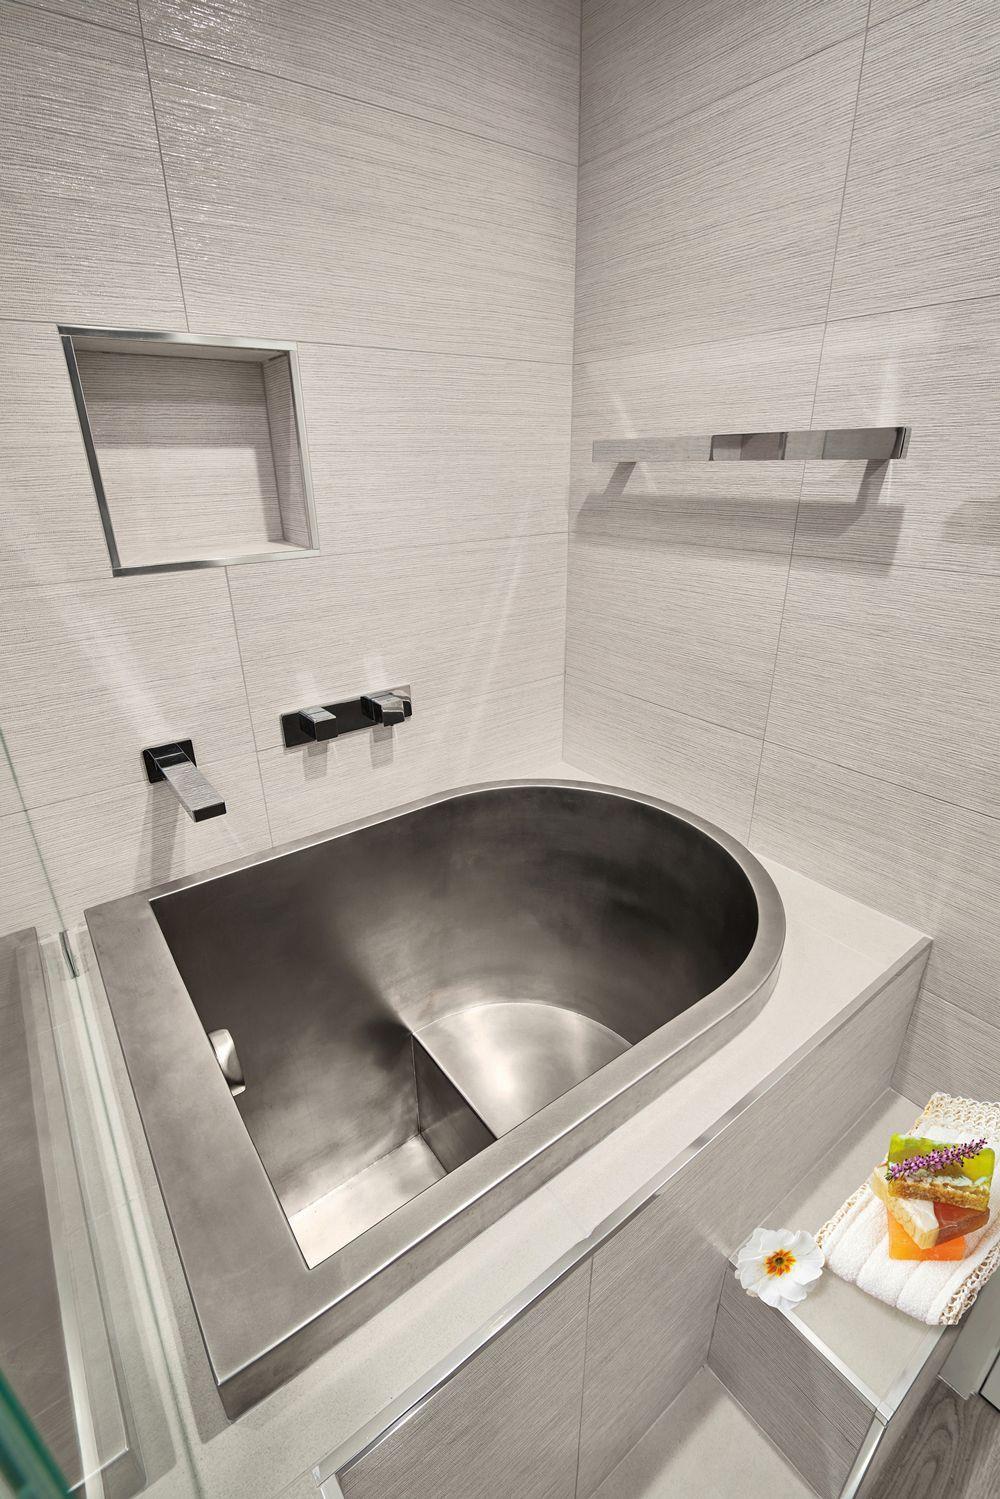 Japanese Soaking Tubs & Baths | Tiny Homes Ideas | Pinterest ...